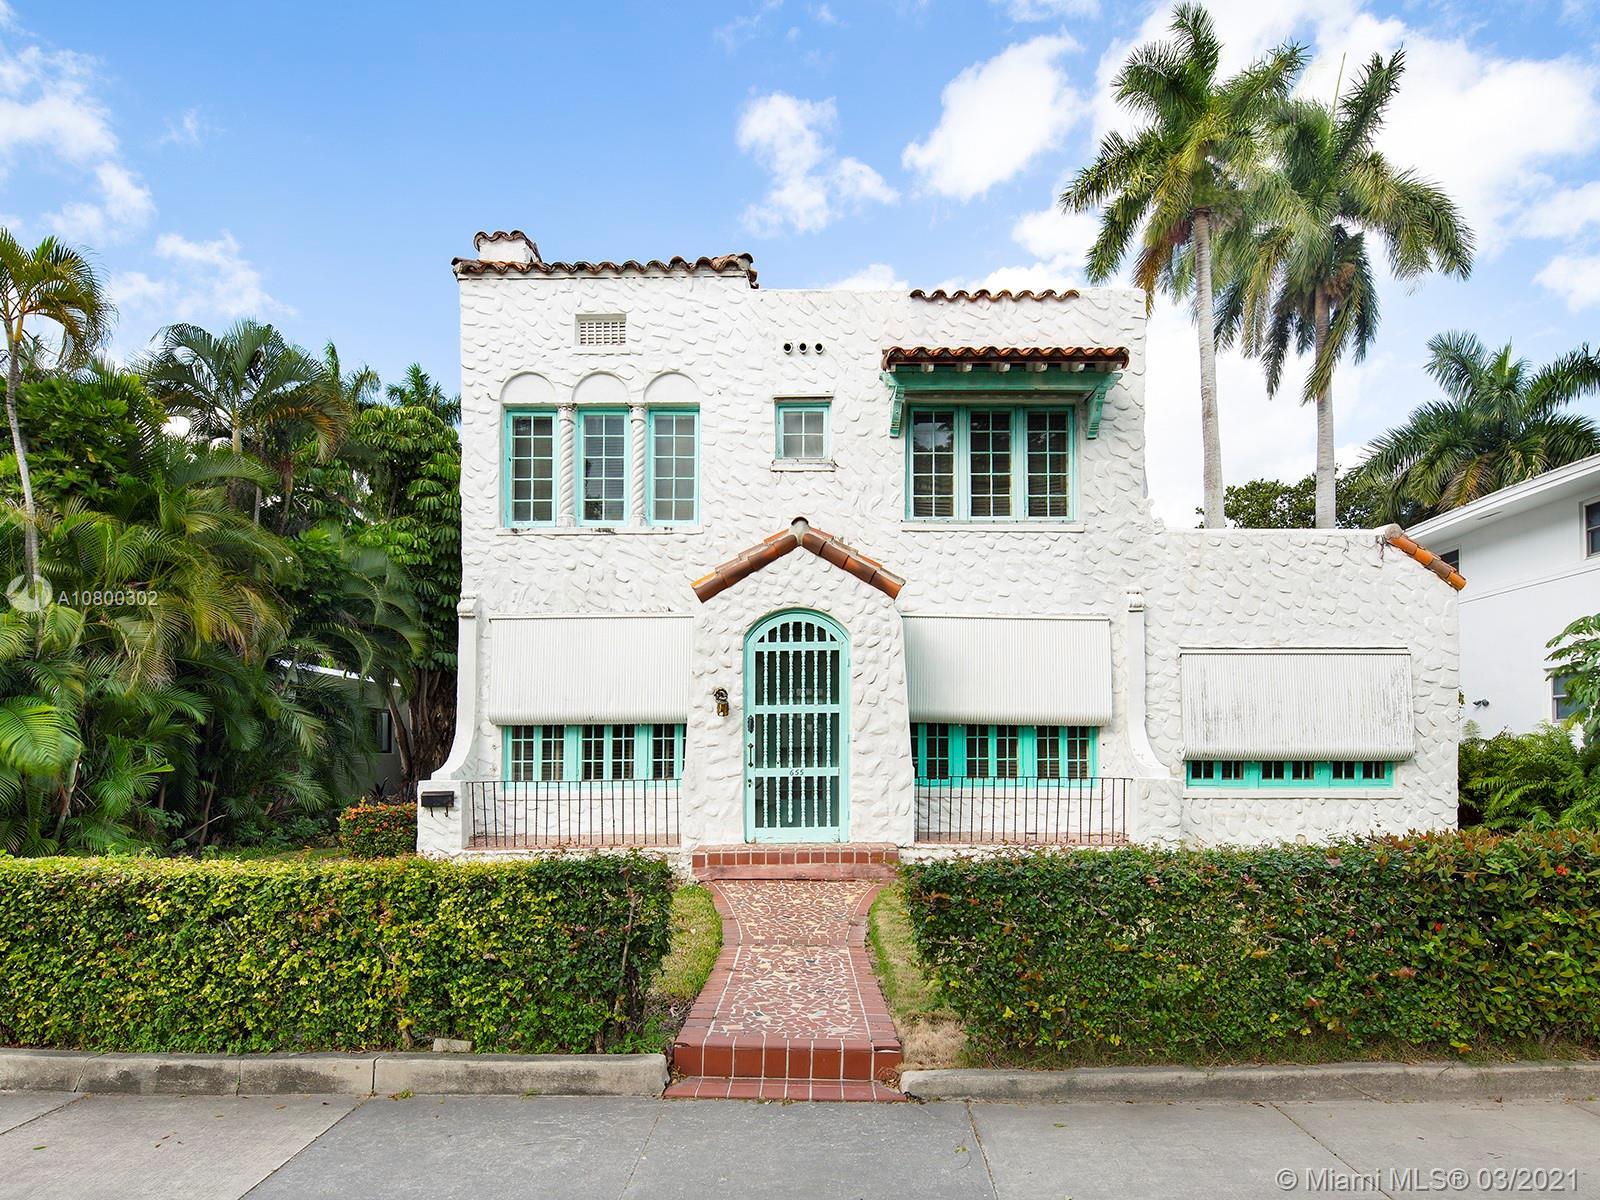 655 NE 55th Ter, Miami, Florida 33137, 6 Bedrooms Bedrooms, ,4 BathroomsBathrooms,Residential,For Sale,655 NE 55th Ter,A10800302